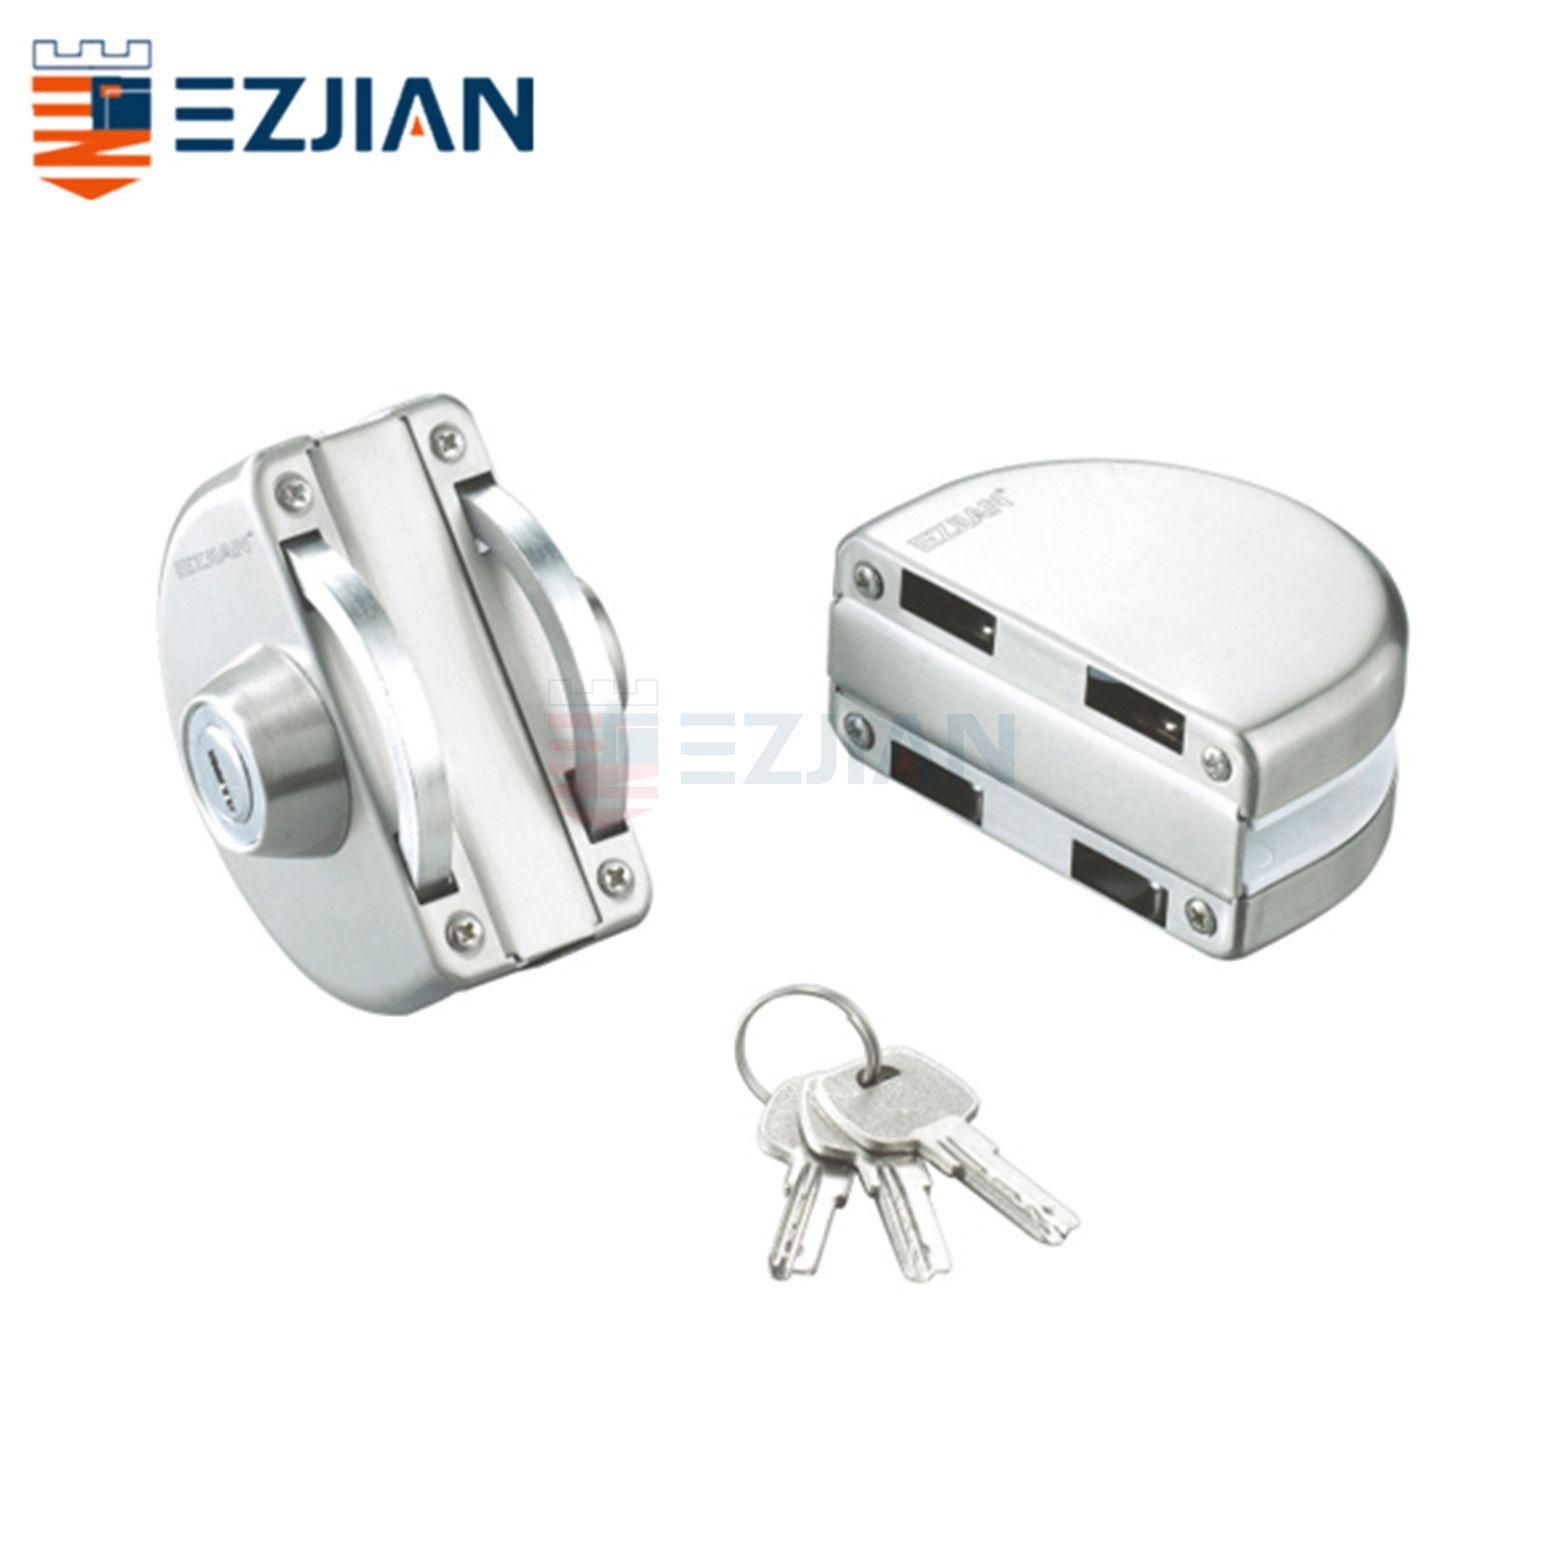 Glass Gate Lock EJ-9014